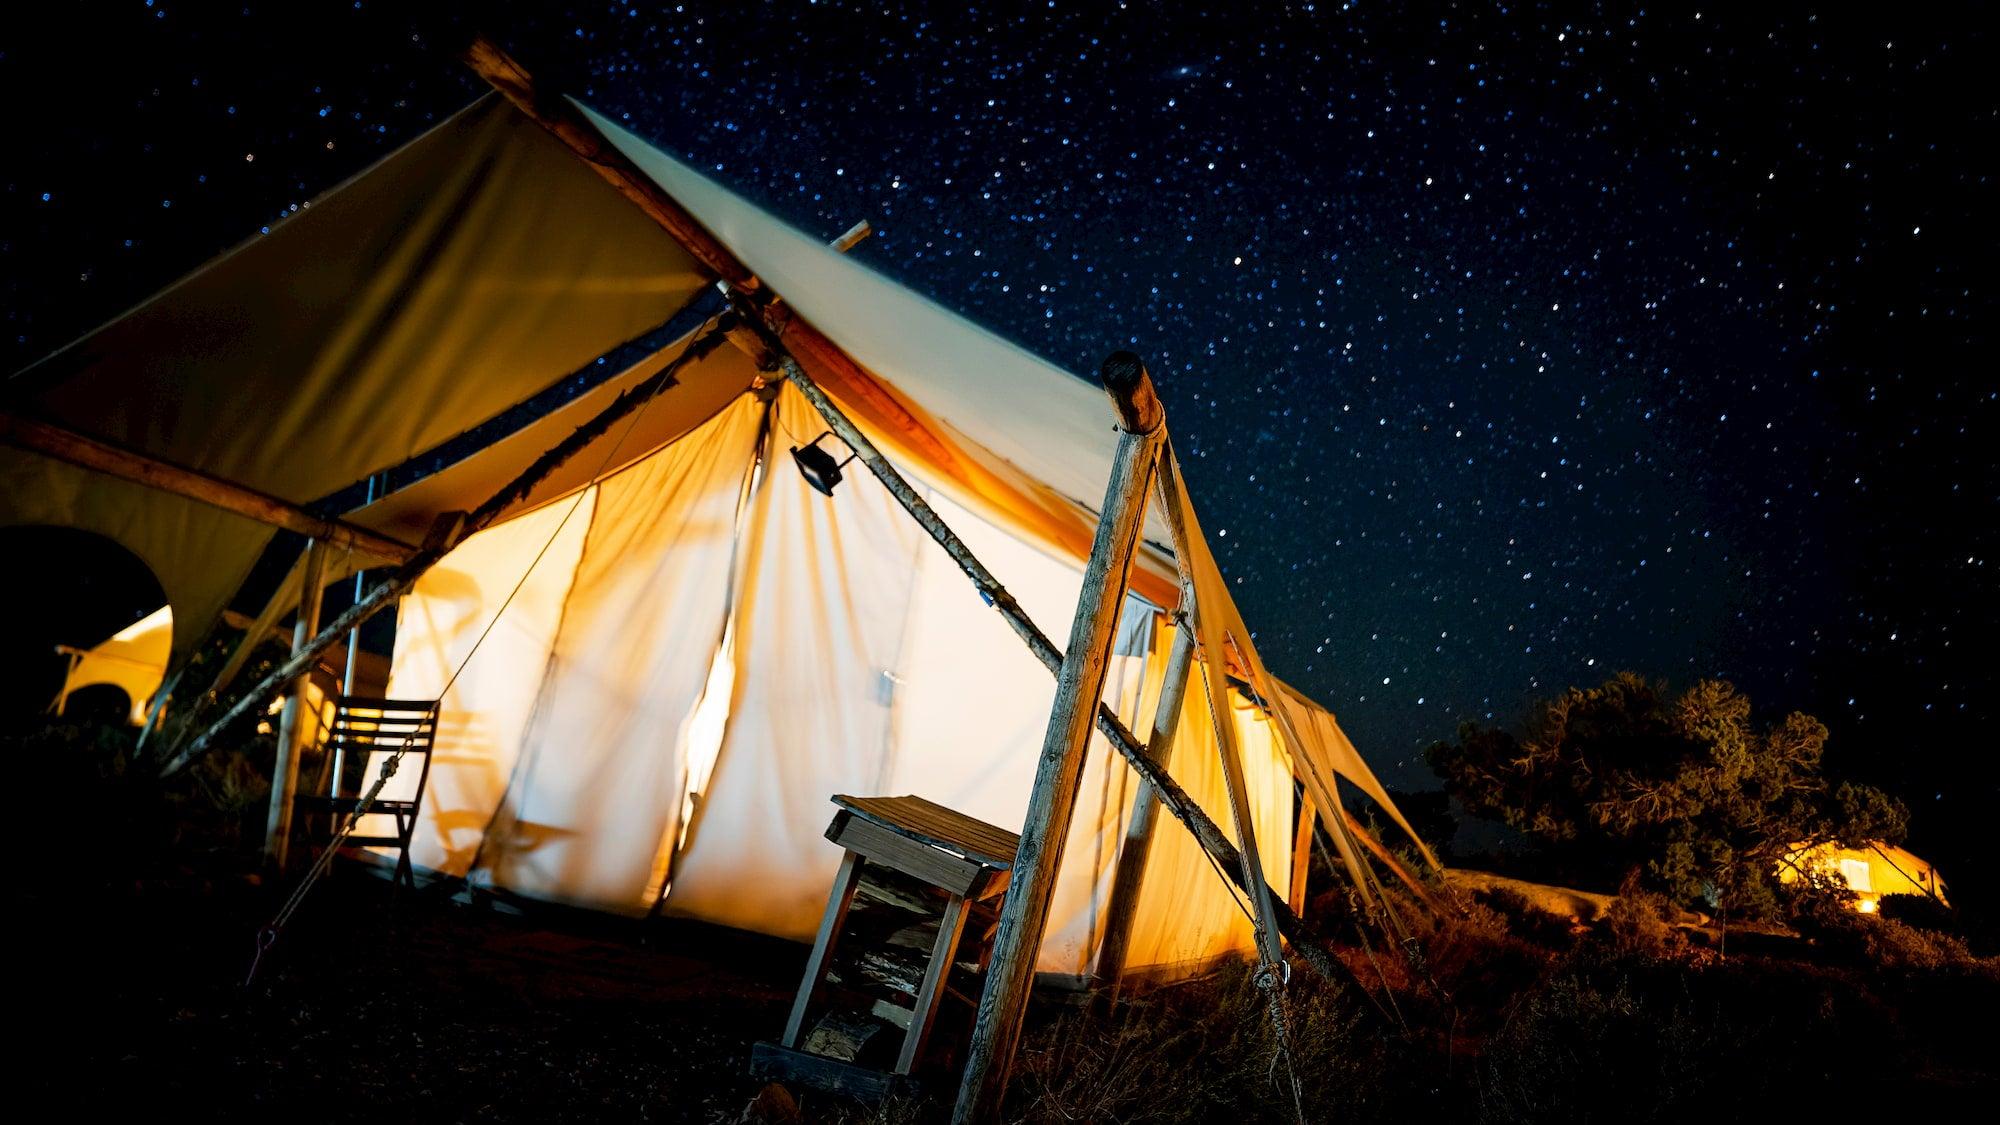 utah glamping tent at night